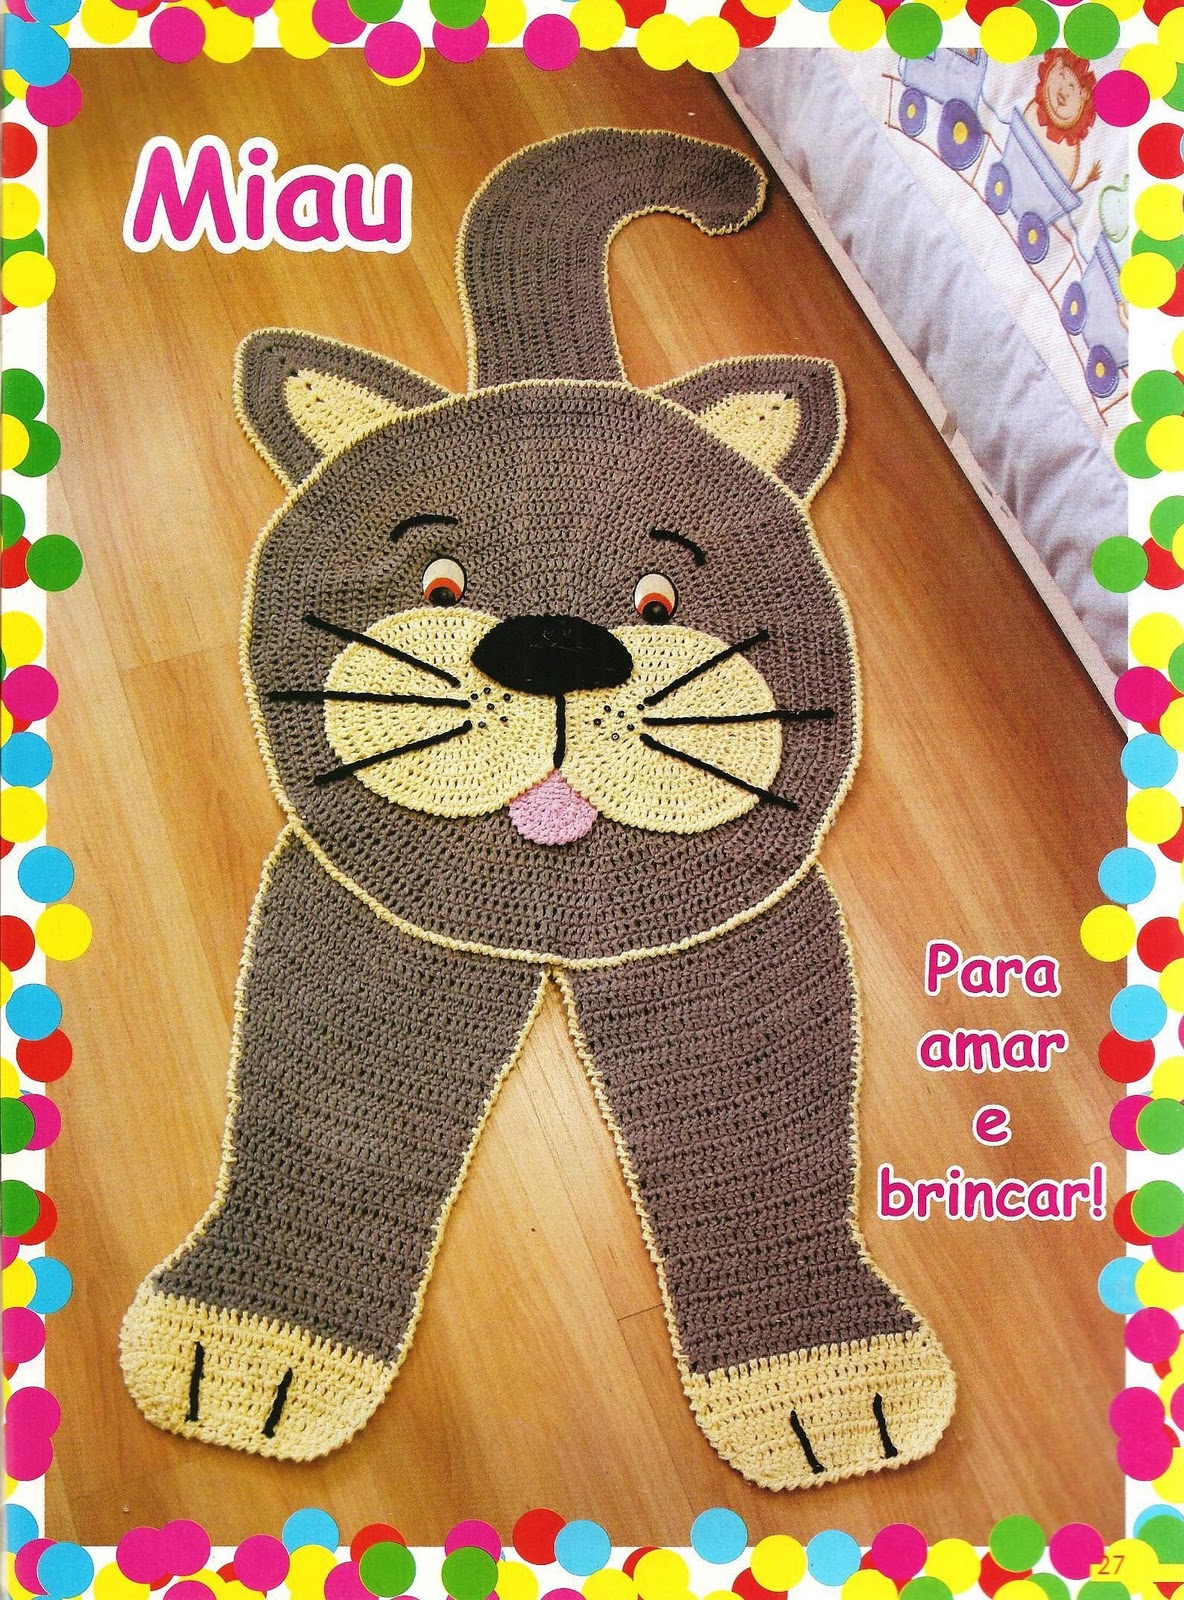 Moda do Crochê: Tapetes infantis em crochê #C6C105 1184 1600